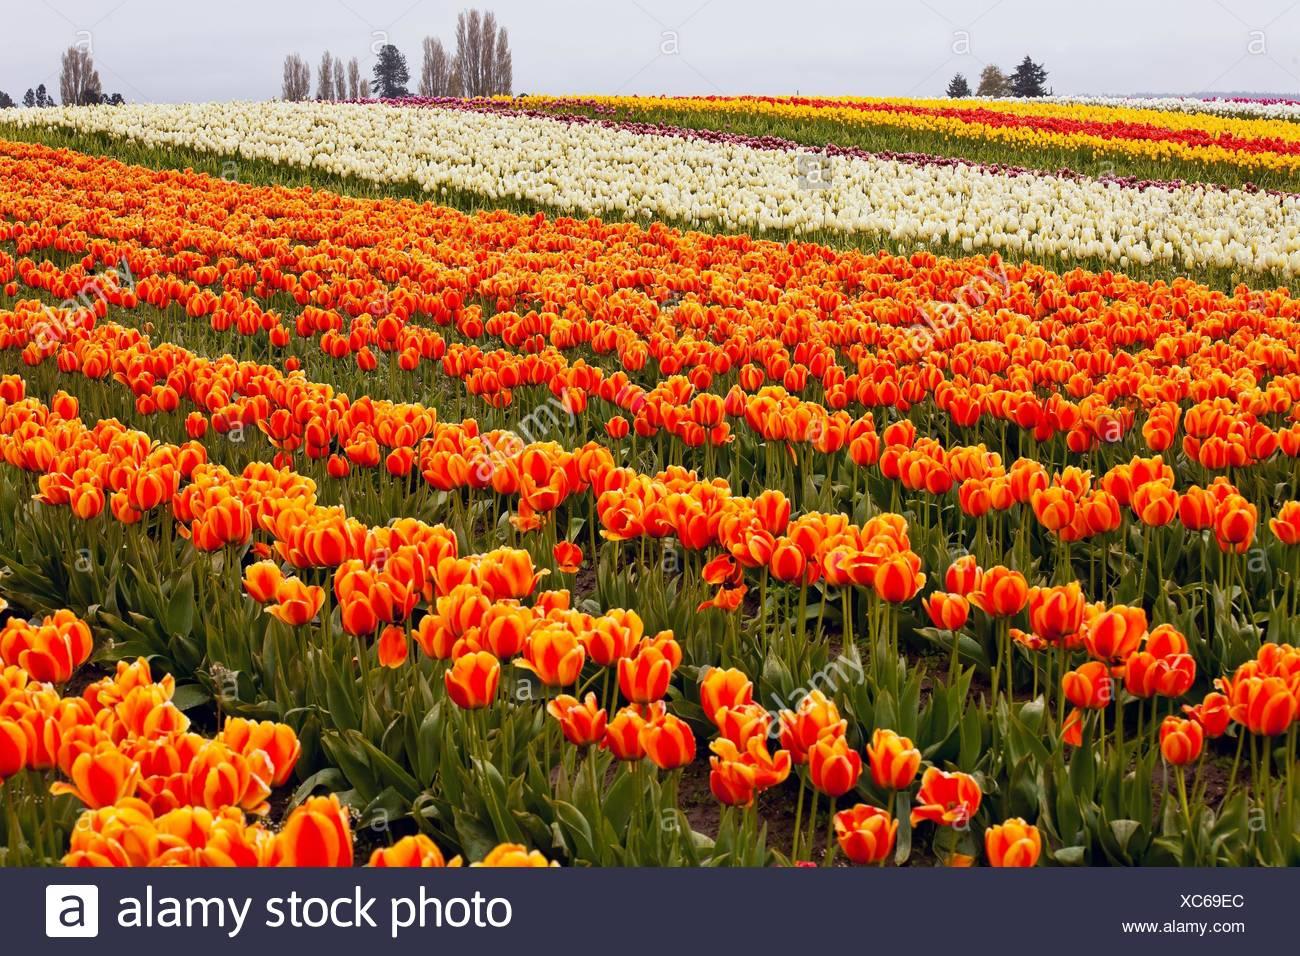 Red Orange White Tulips Flowers Field Skagit Valley Farm Washington